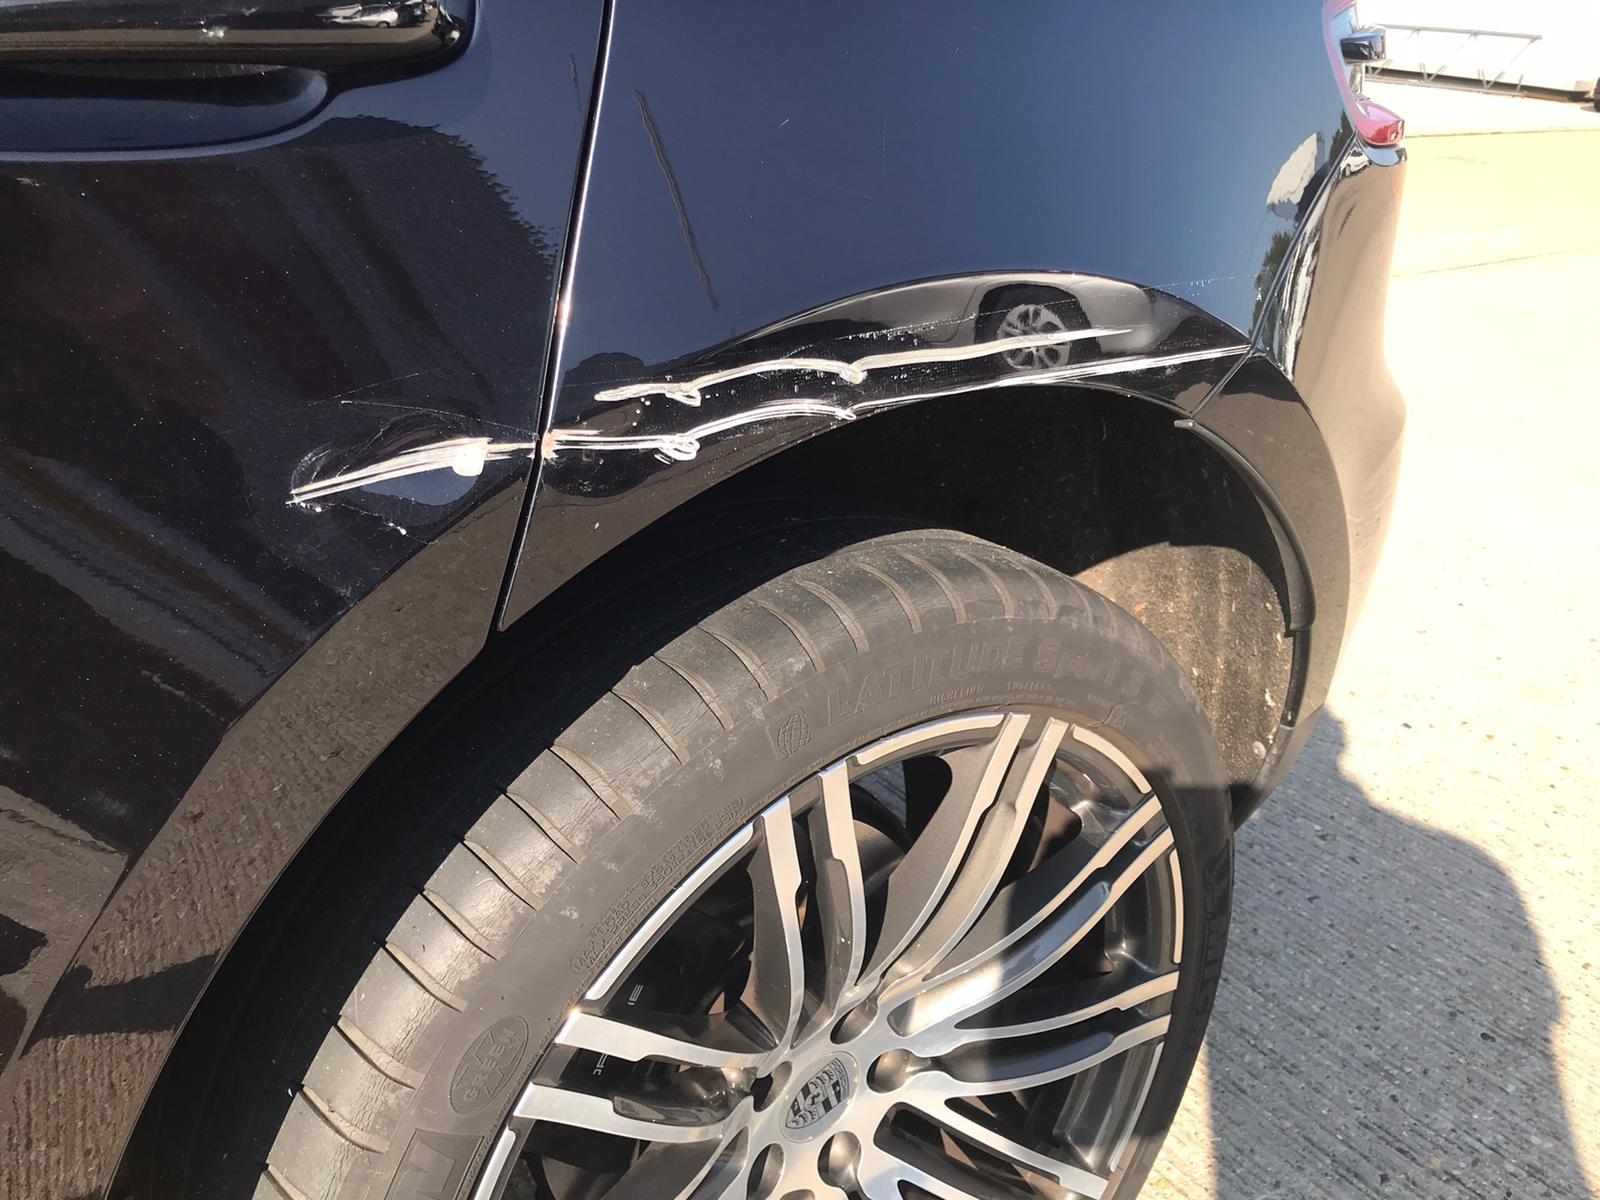 Porsche Macan Bodywork Repair London